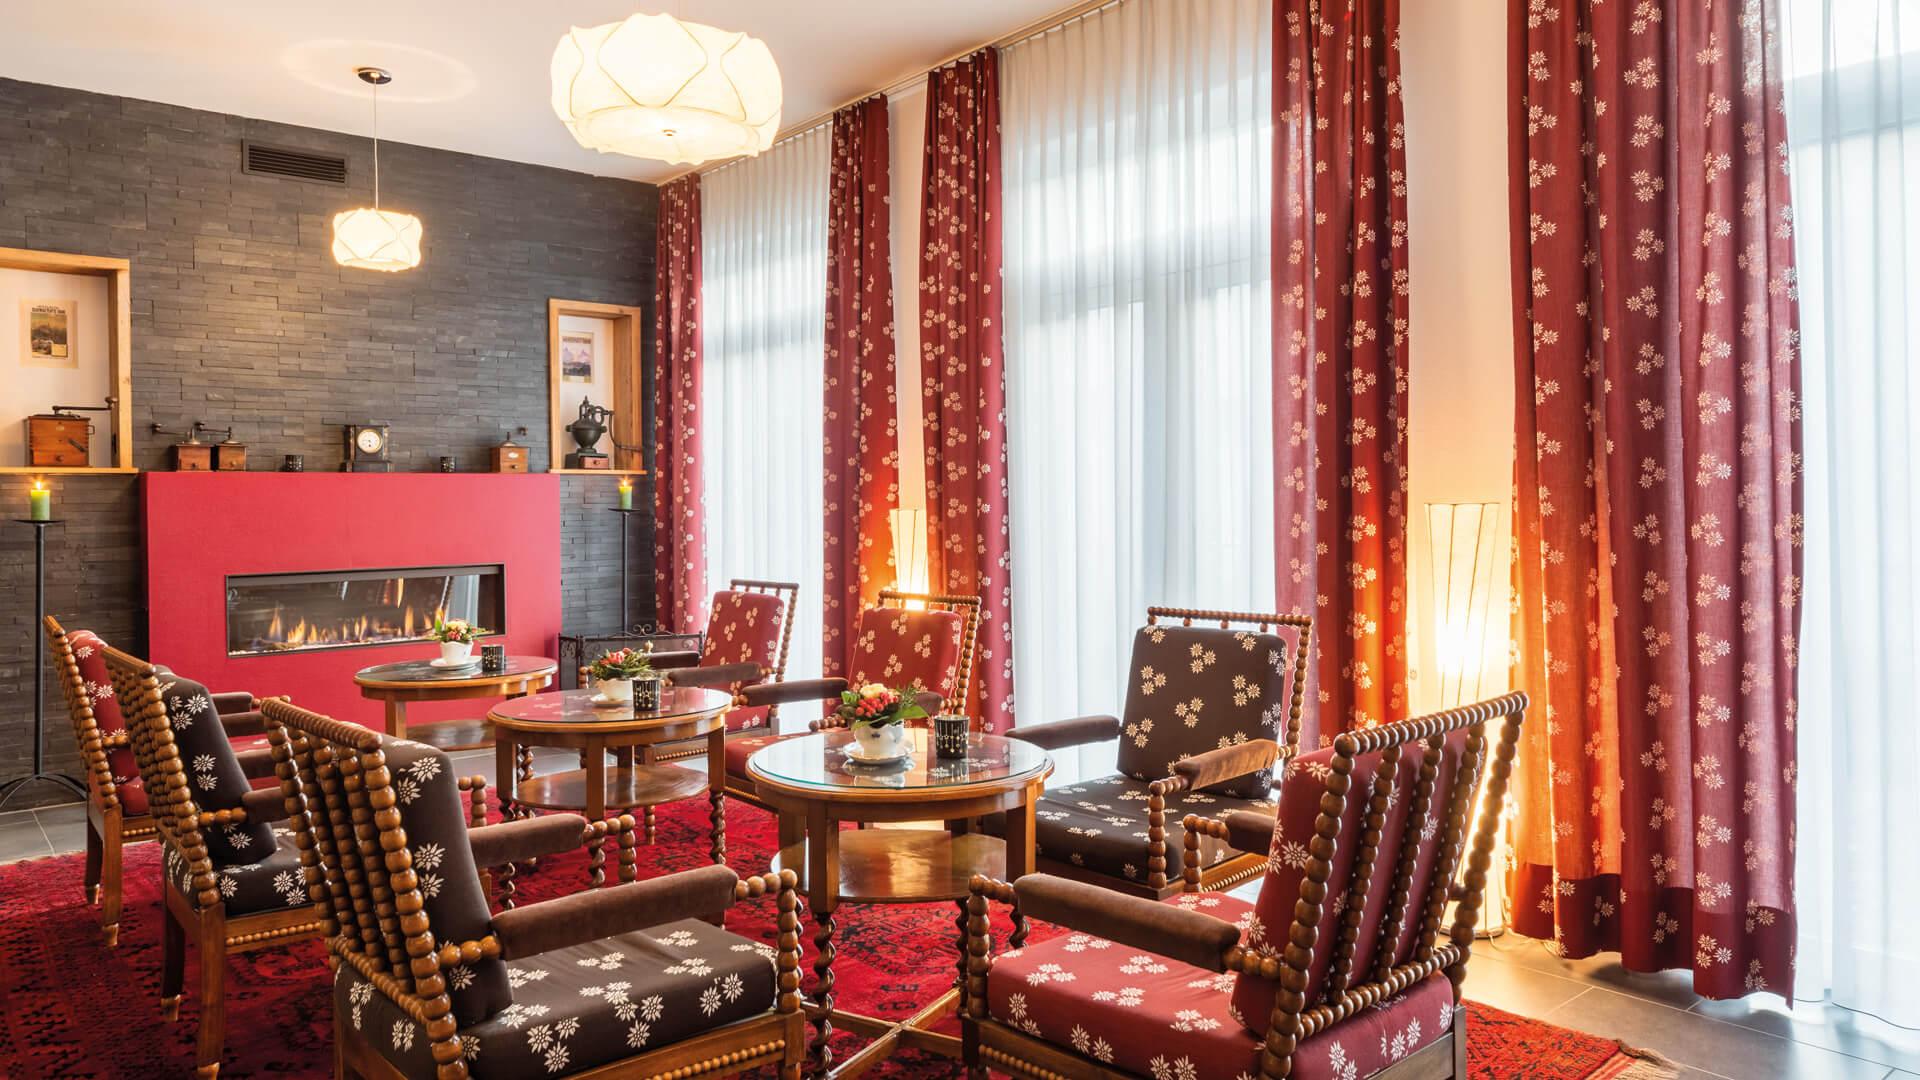 carlton-europe-hotel-lobby-mit-feuer